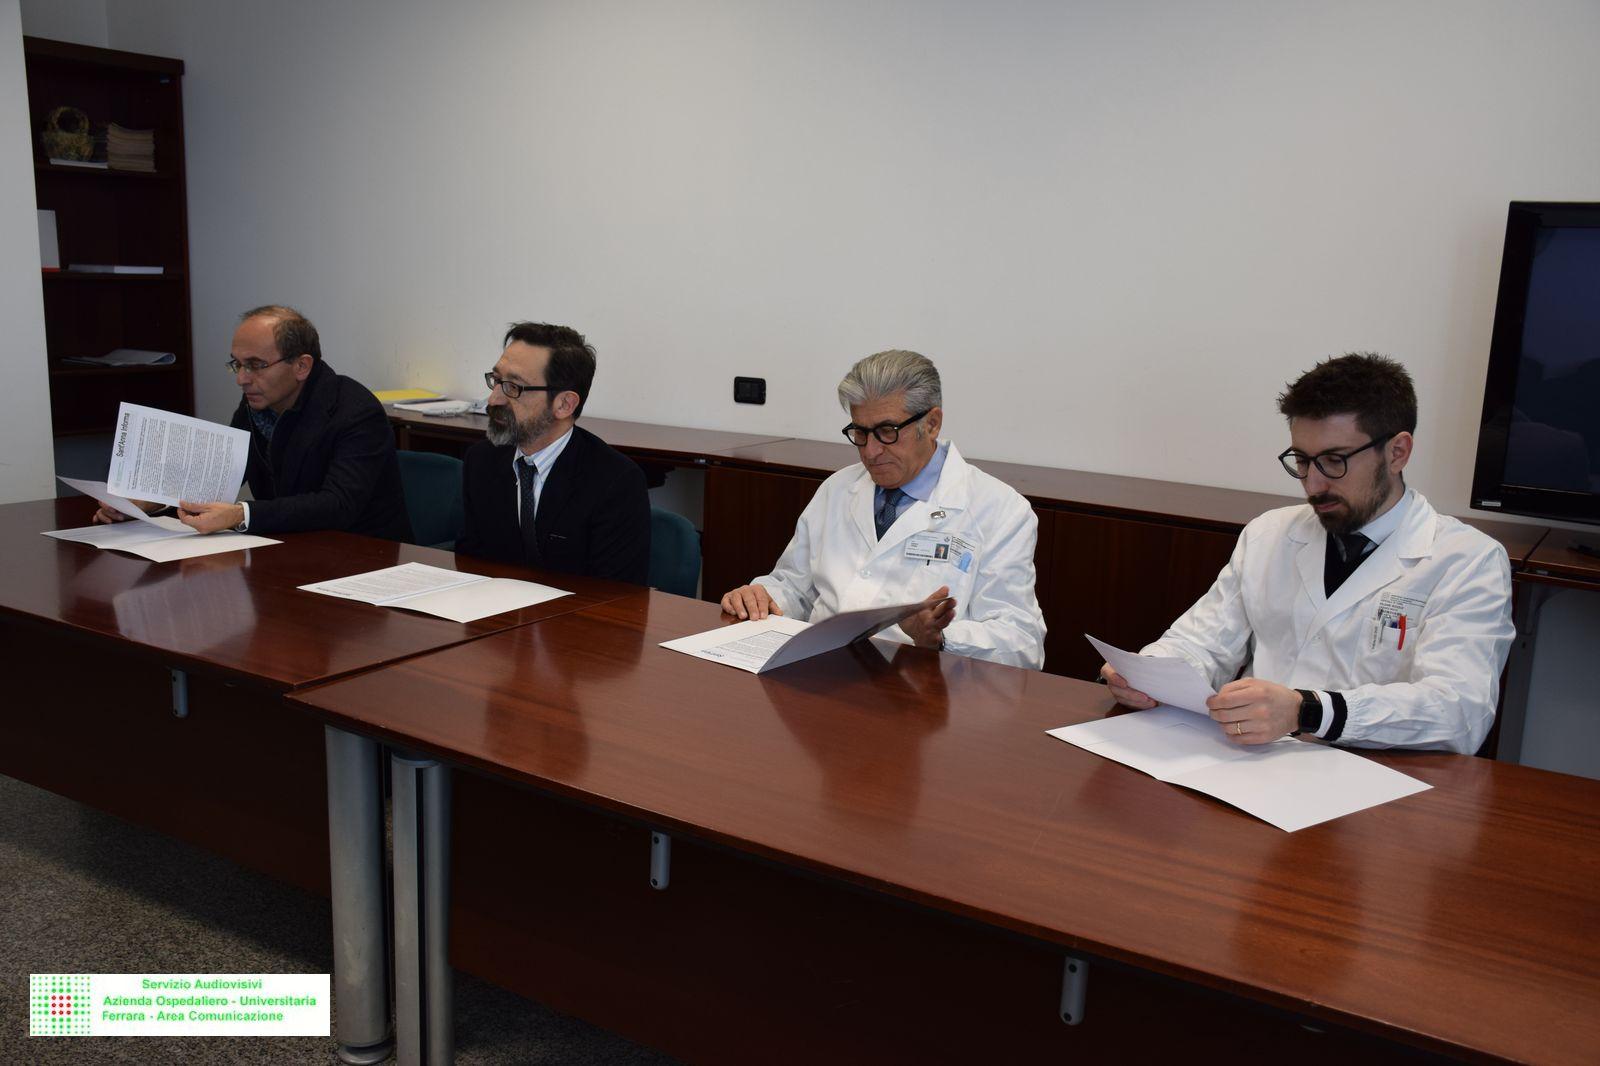 5-2-2019 Conf Stampa Cross-Linking Oculistica Lamberti-Di Ruscio-Perri-Salgari (1)